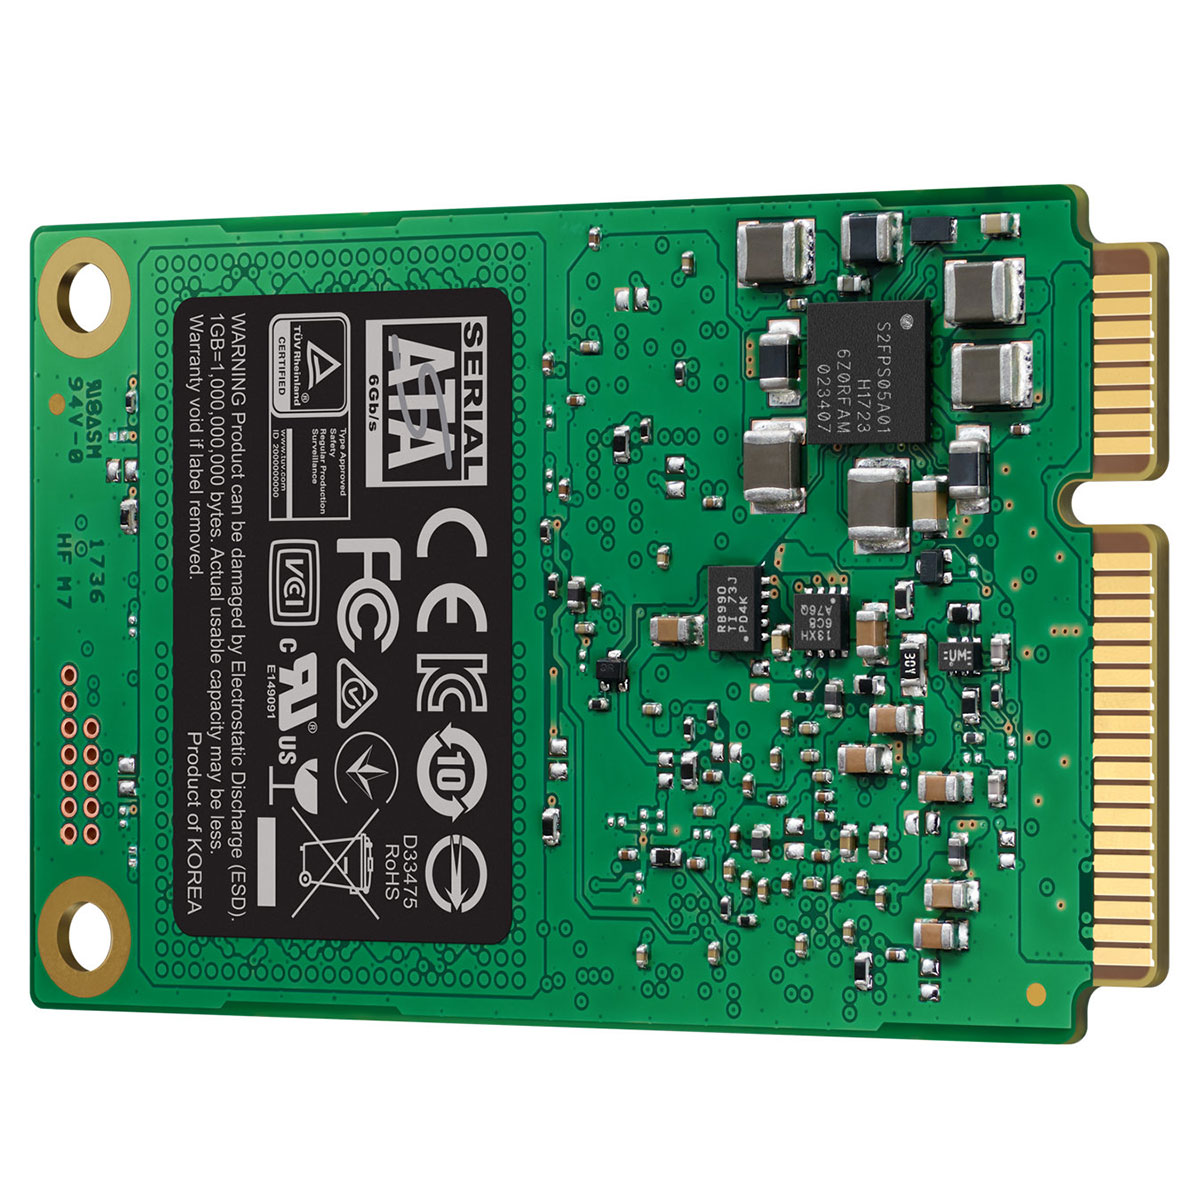 Samsung 860 EVO 240-275Go - Disque SSD Samsung - Cybertek.fr - 2